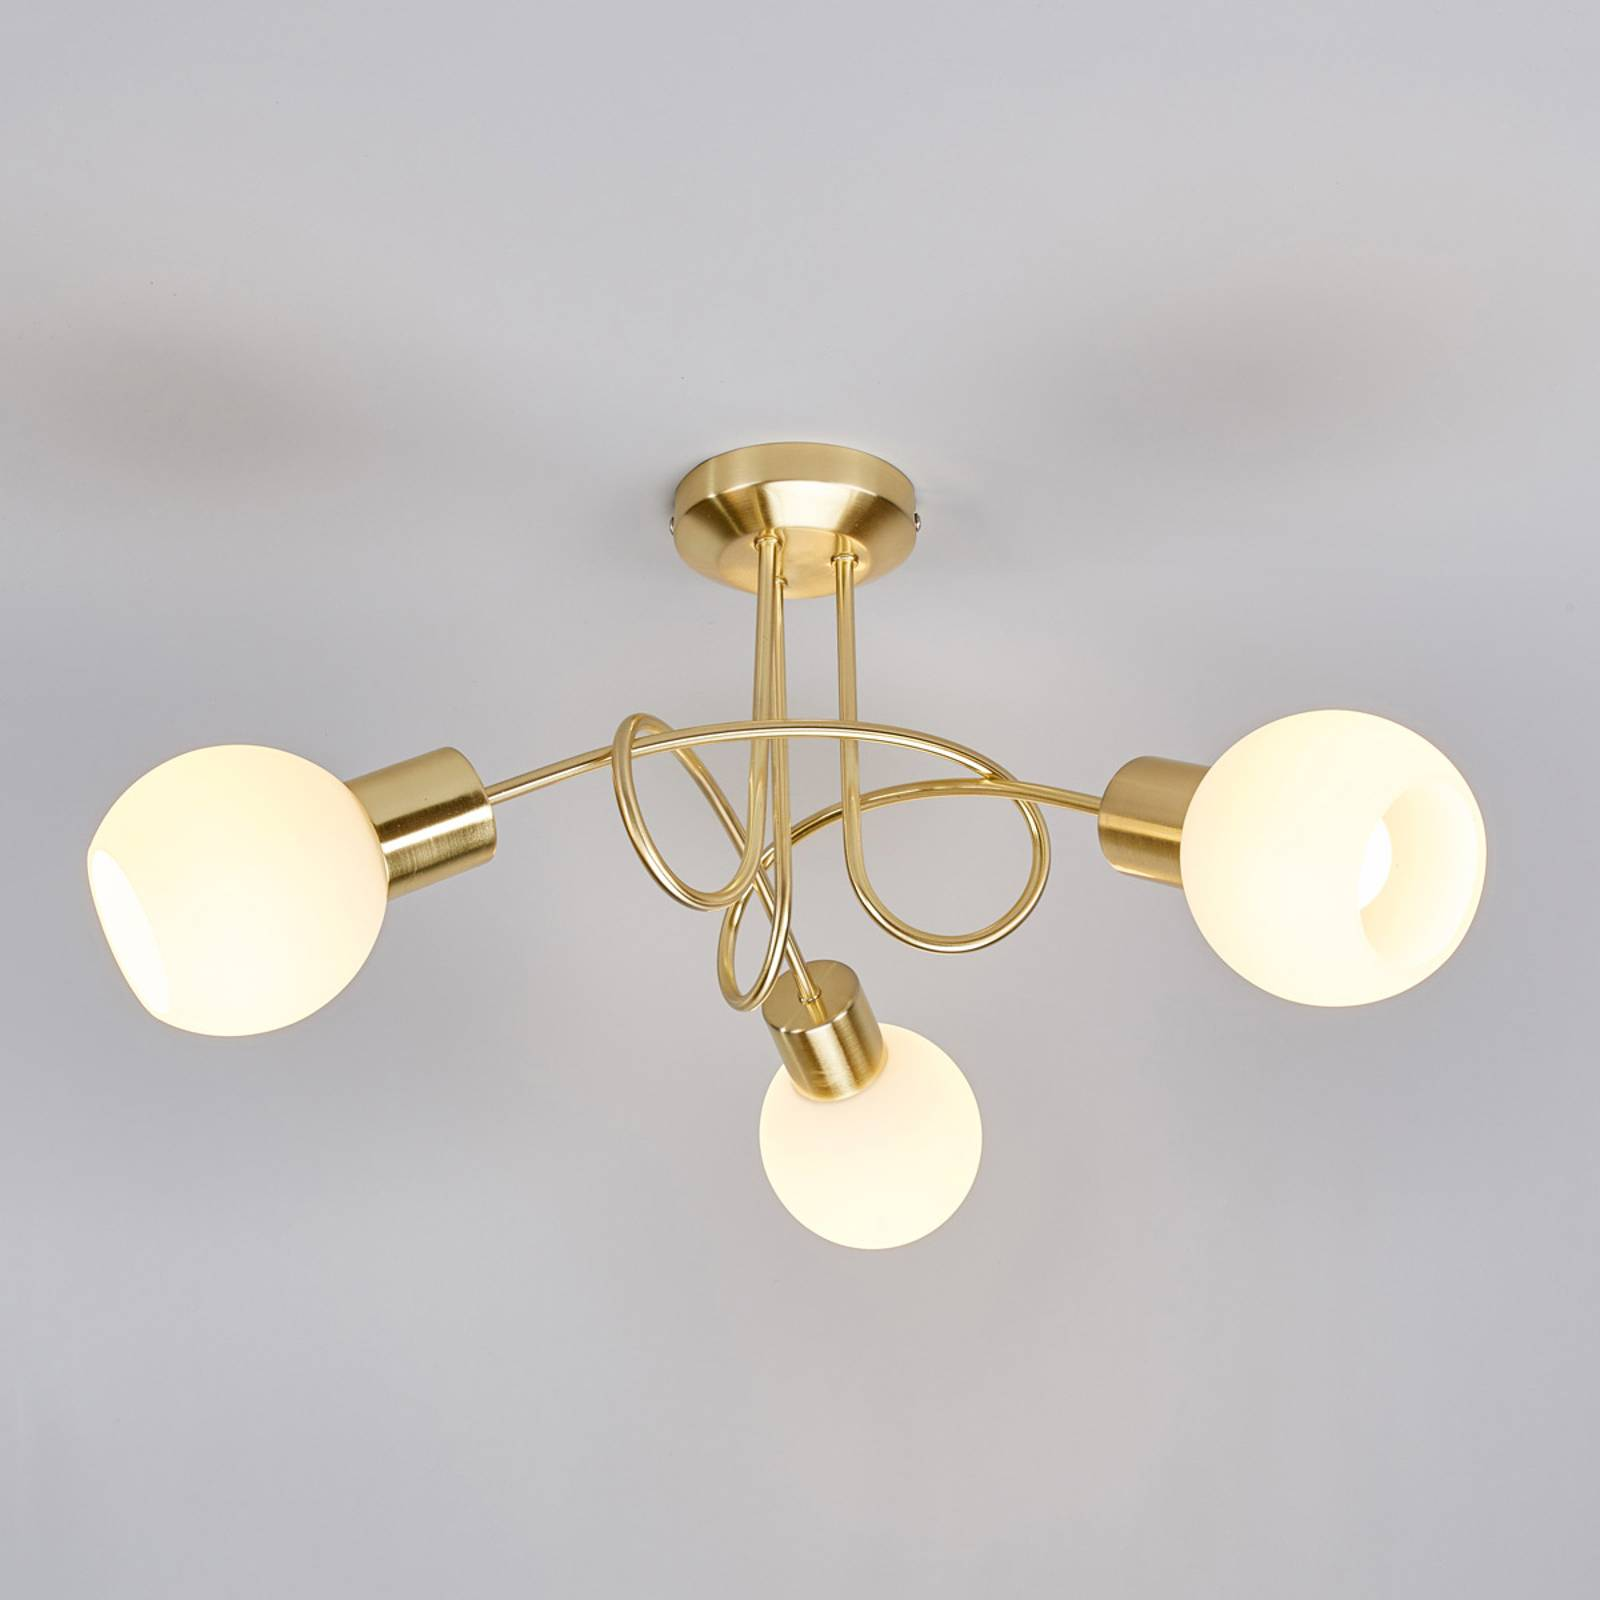 Messingkleurige LED-plafondlamp Elaina, 3-lichts